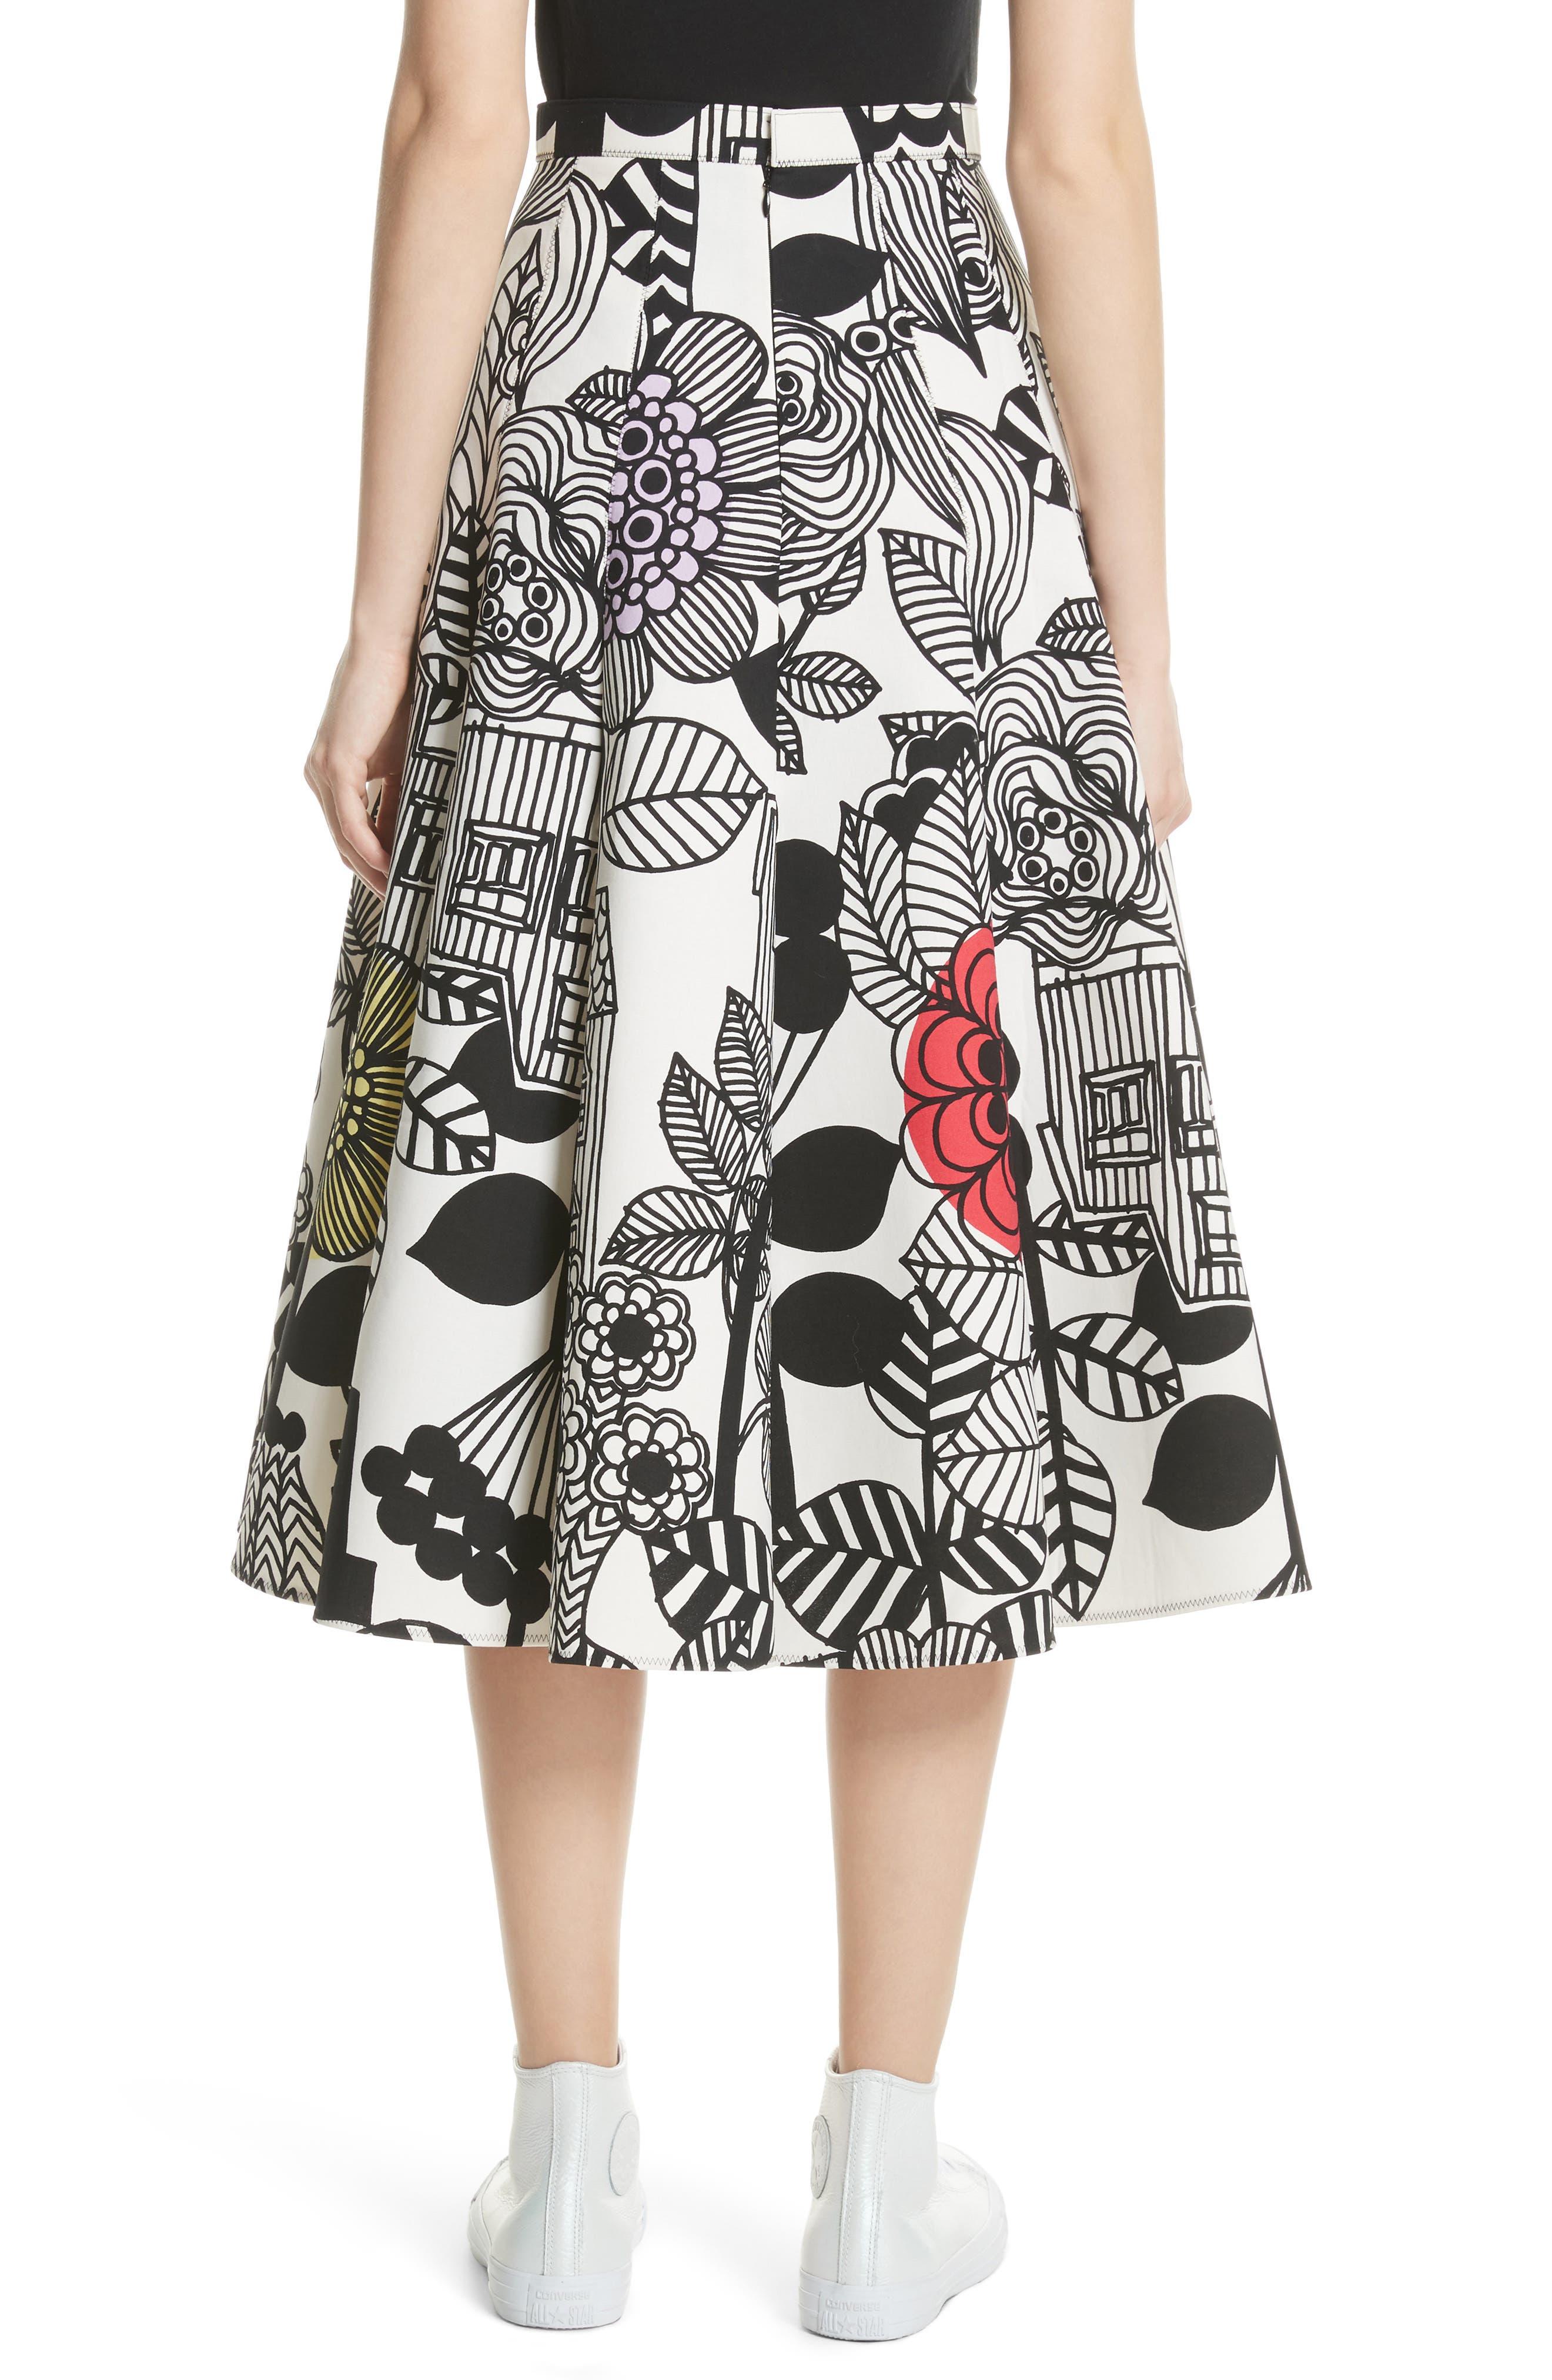 x Marimekko Vegetable Print Cotton Skirt,                             Alternate thumbnail 2, color,                             100